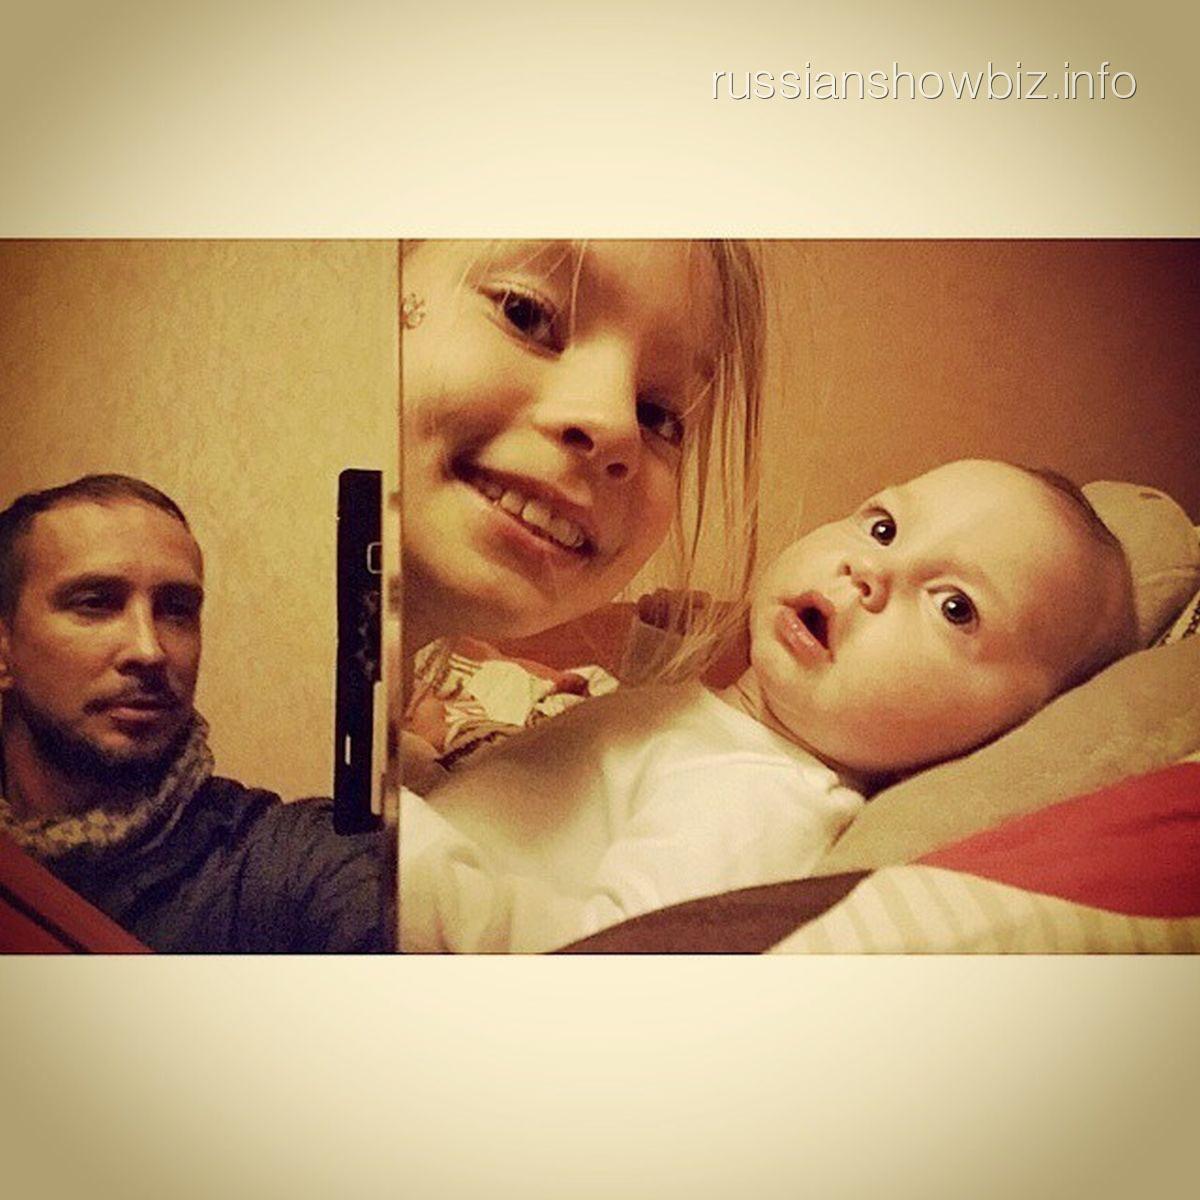 Певец Данко и его дочери